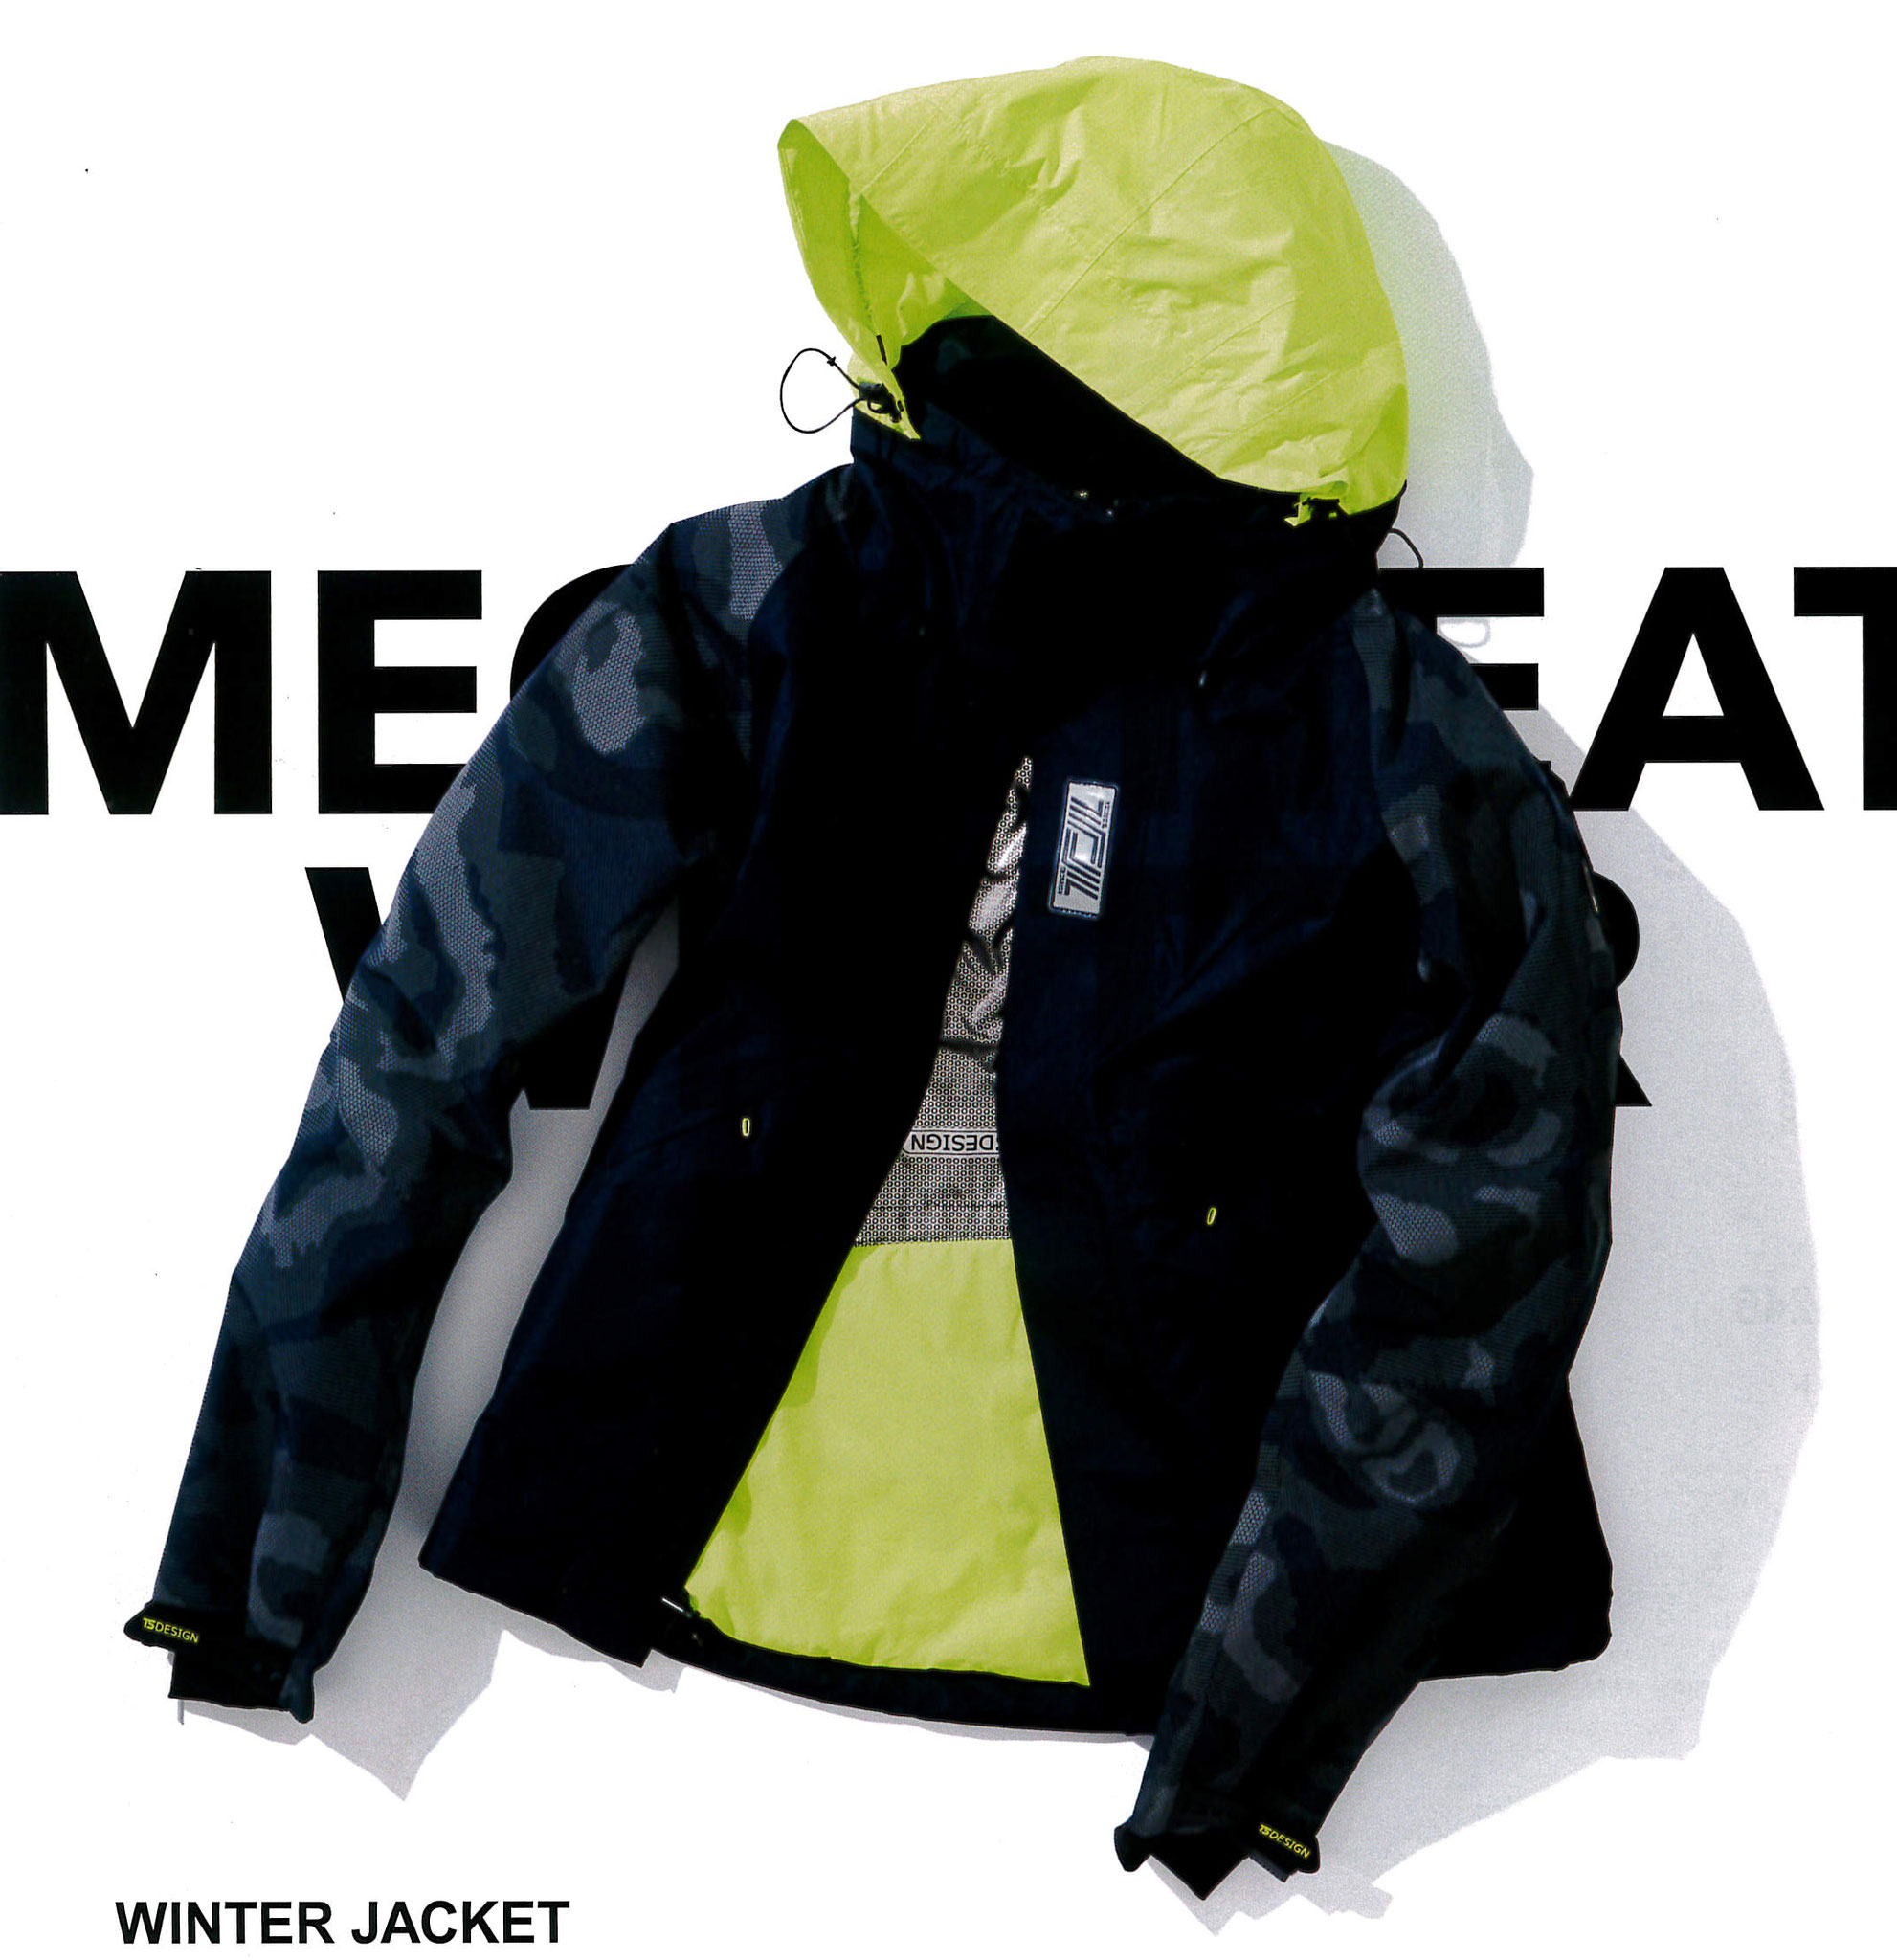 TS DESIGN  18236 メガヒートフラッシュ防水防寒ジャケット ¥14,900(税込)参考価格の53%OFF